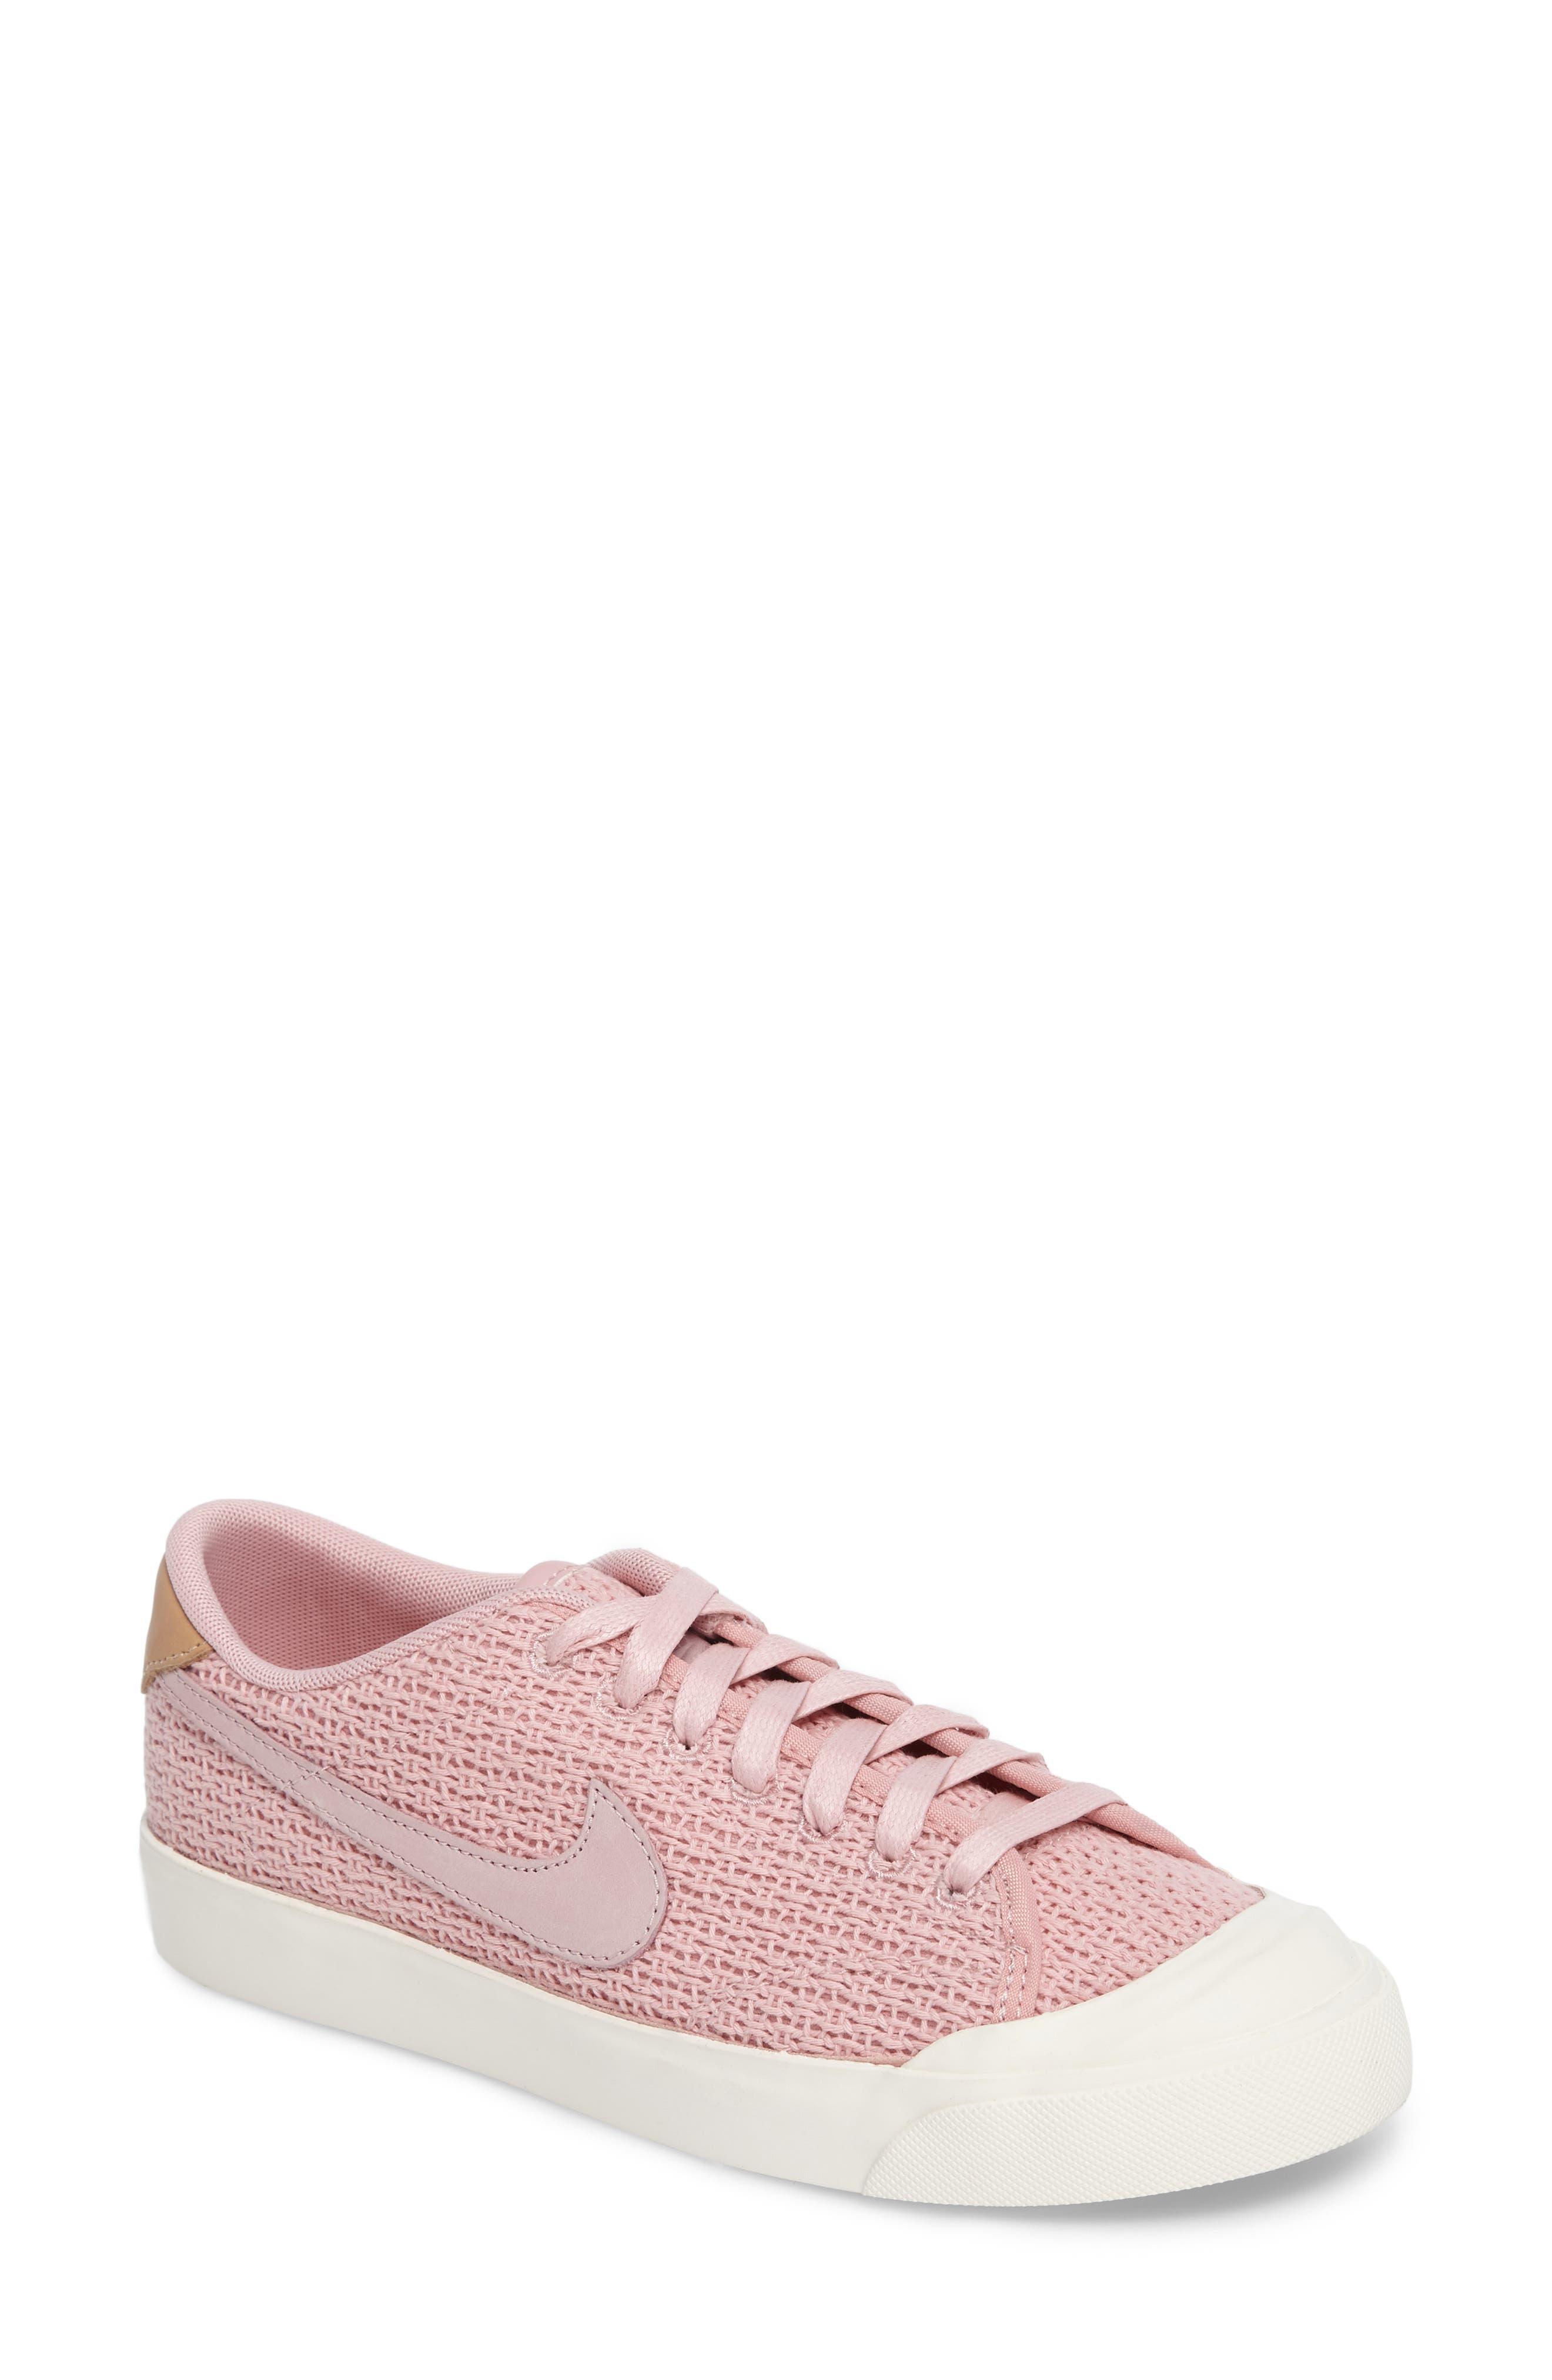 Main Image - Nike All Court 2 Sneaker (Women)